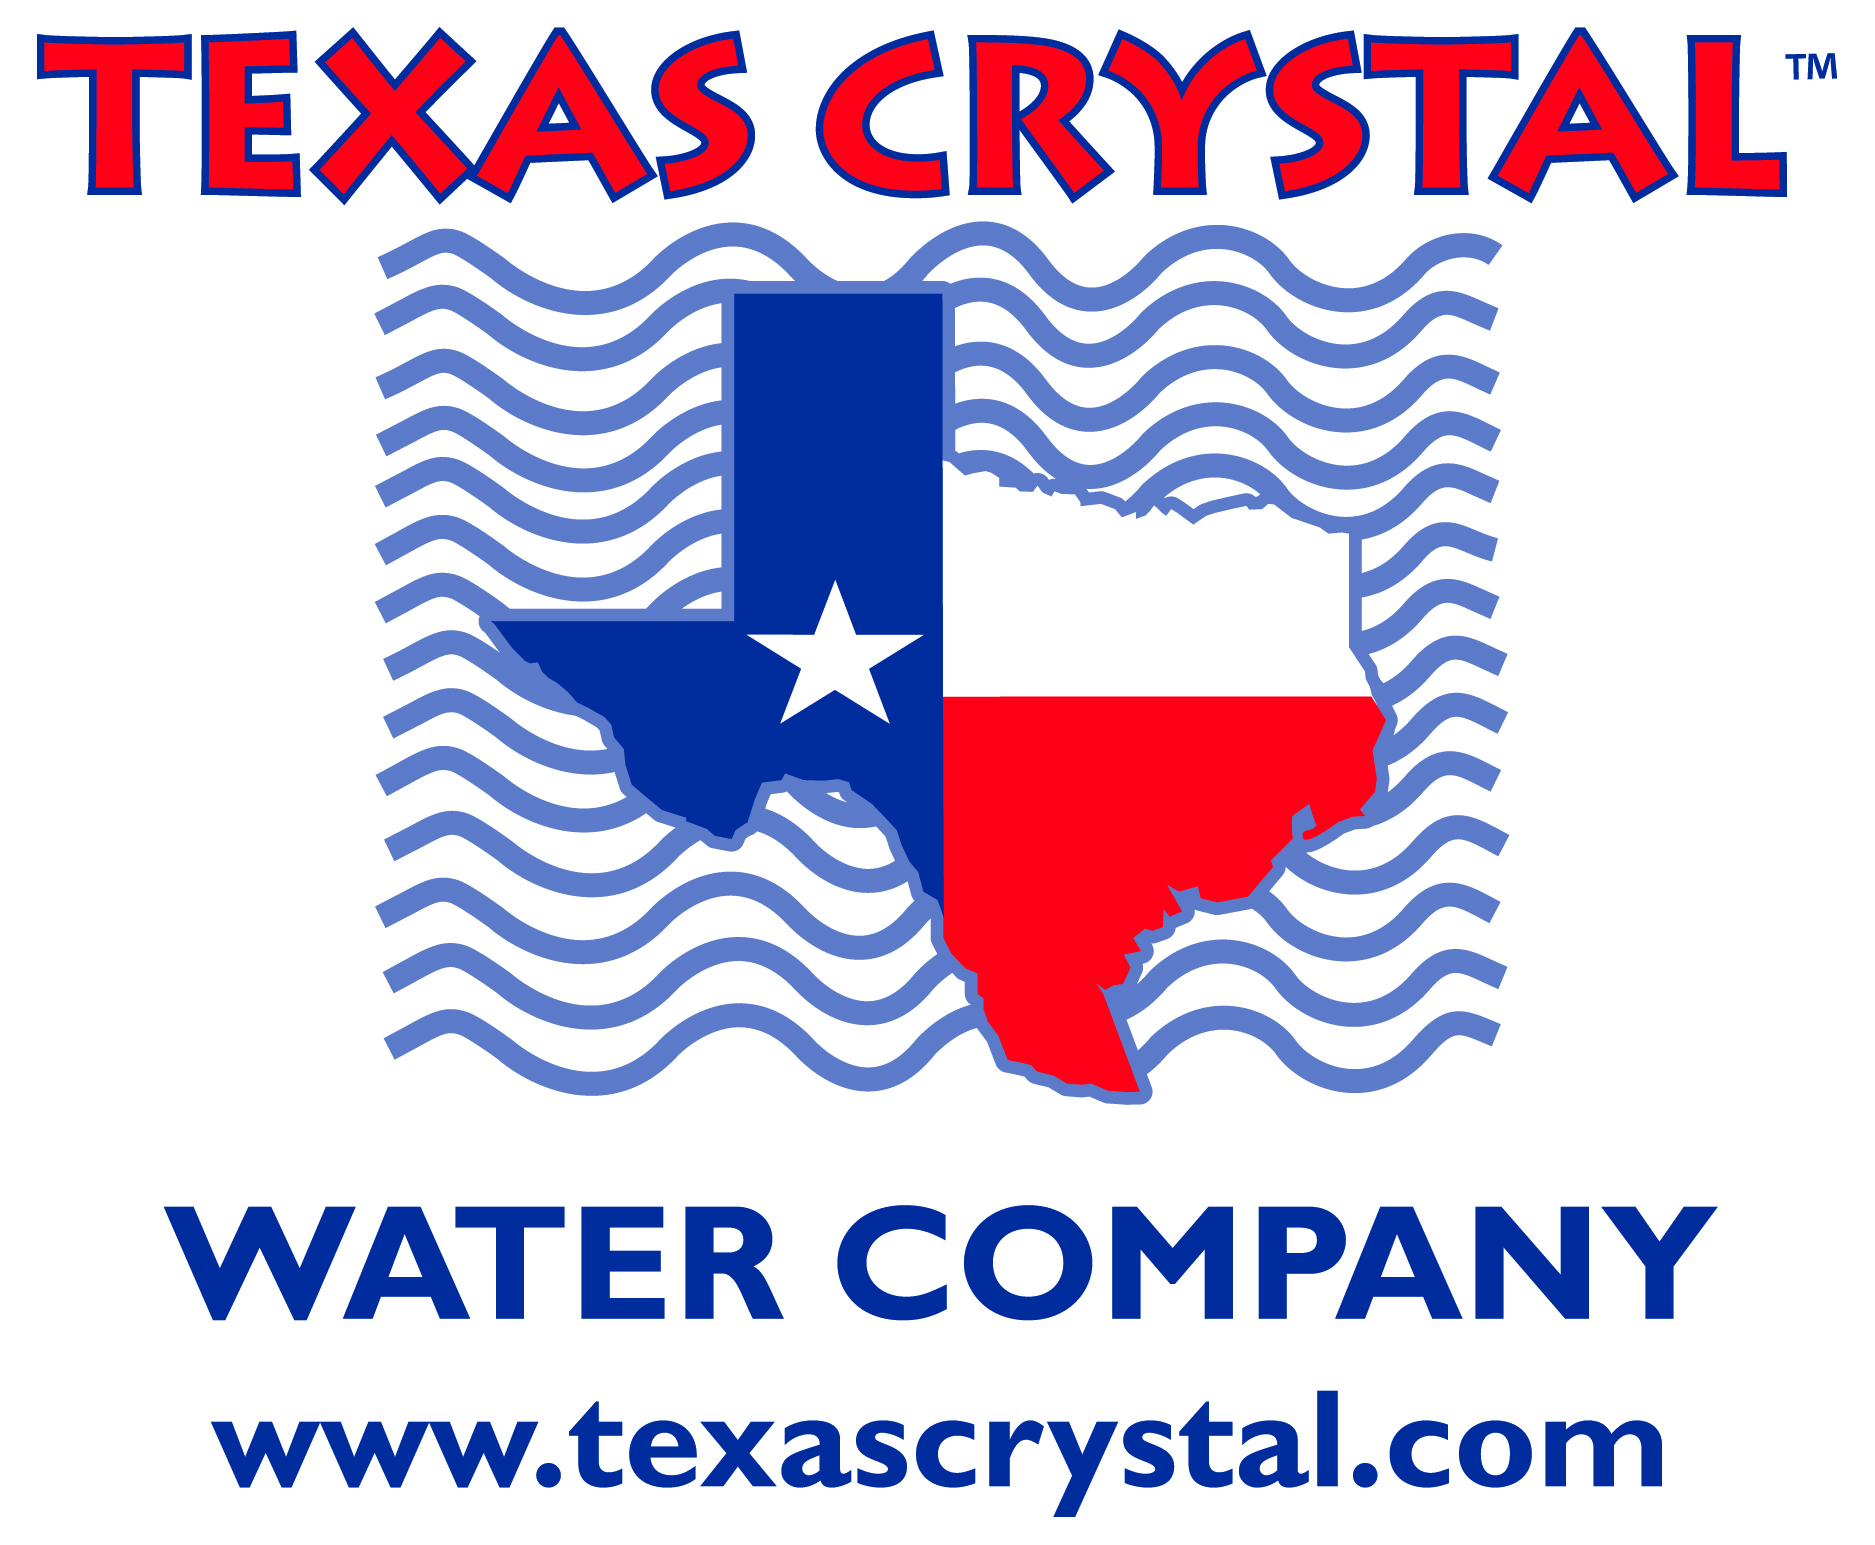 TexasCrystal_logo2.jpg